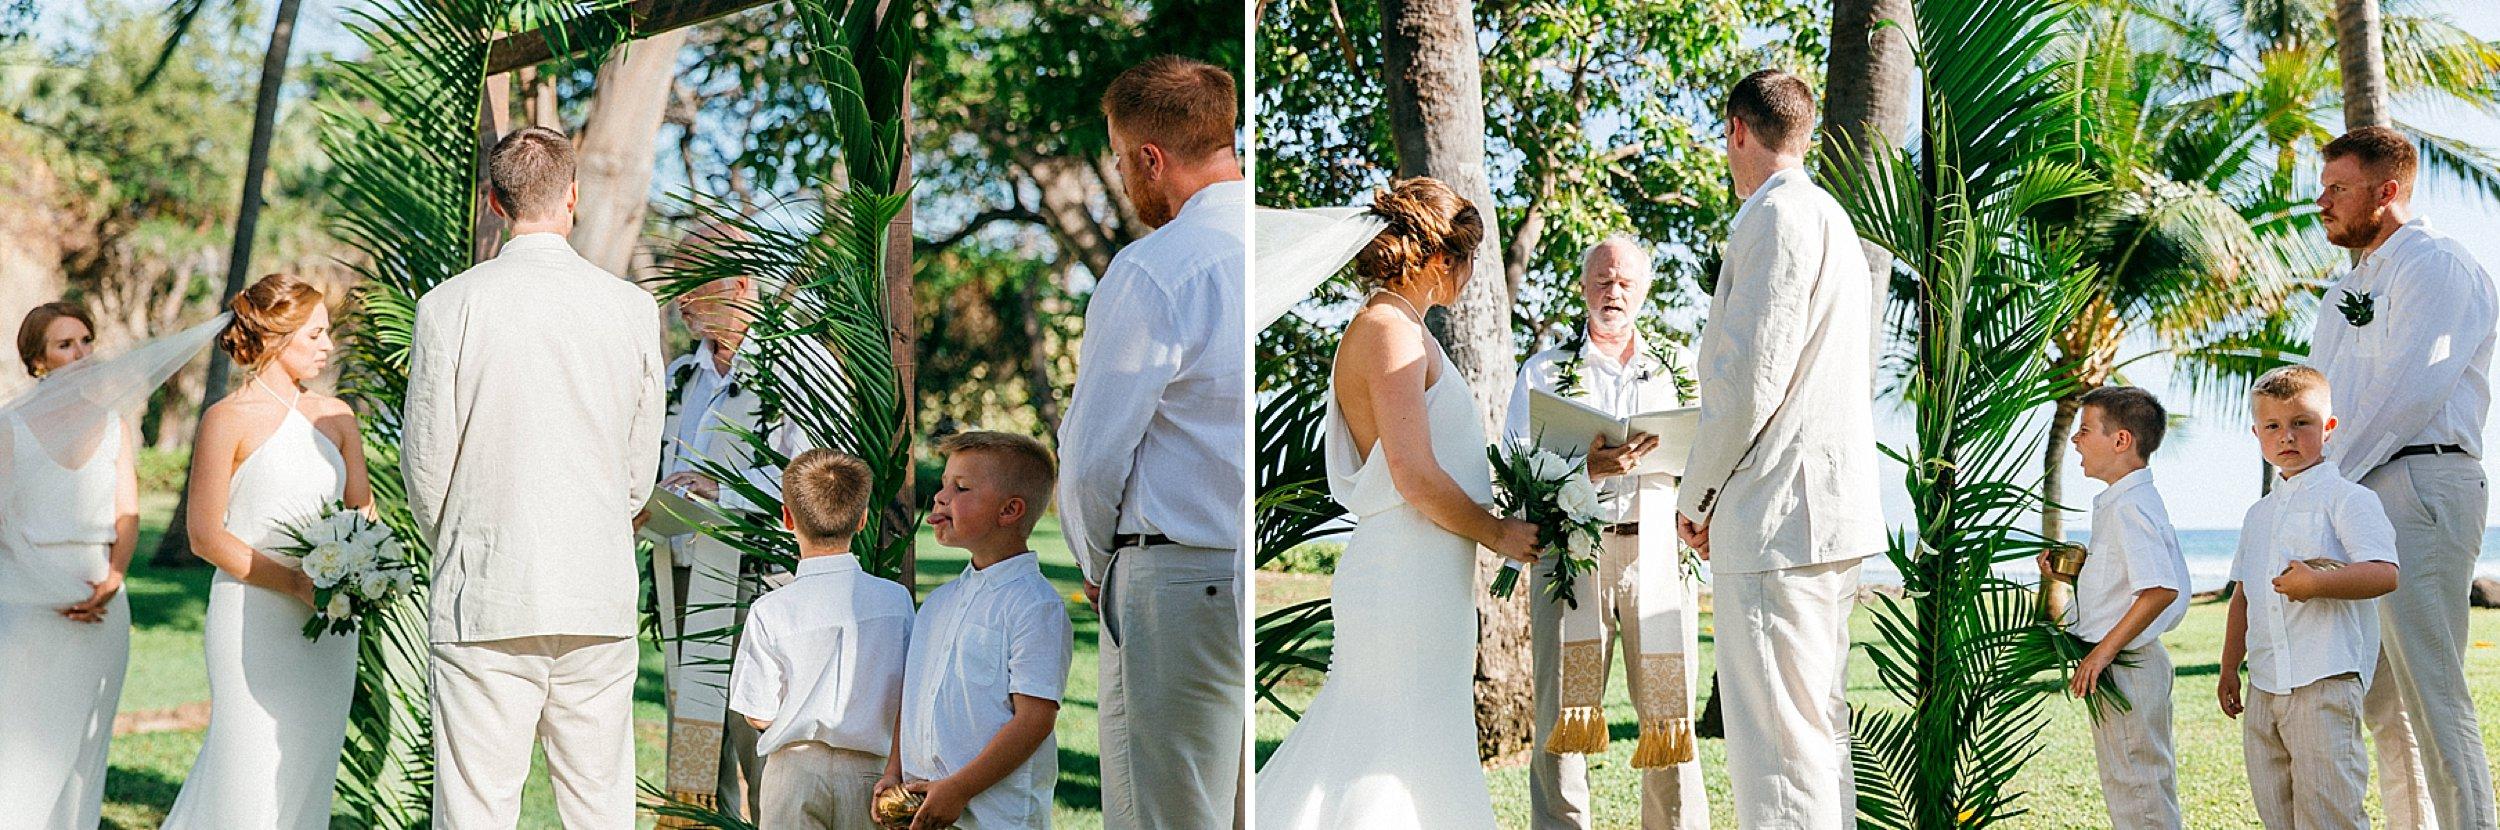 maui-wedding-at-olowalu-plantation-house_0062.jpg